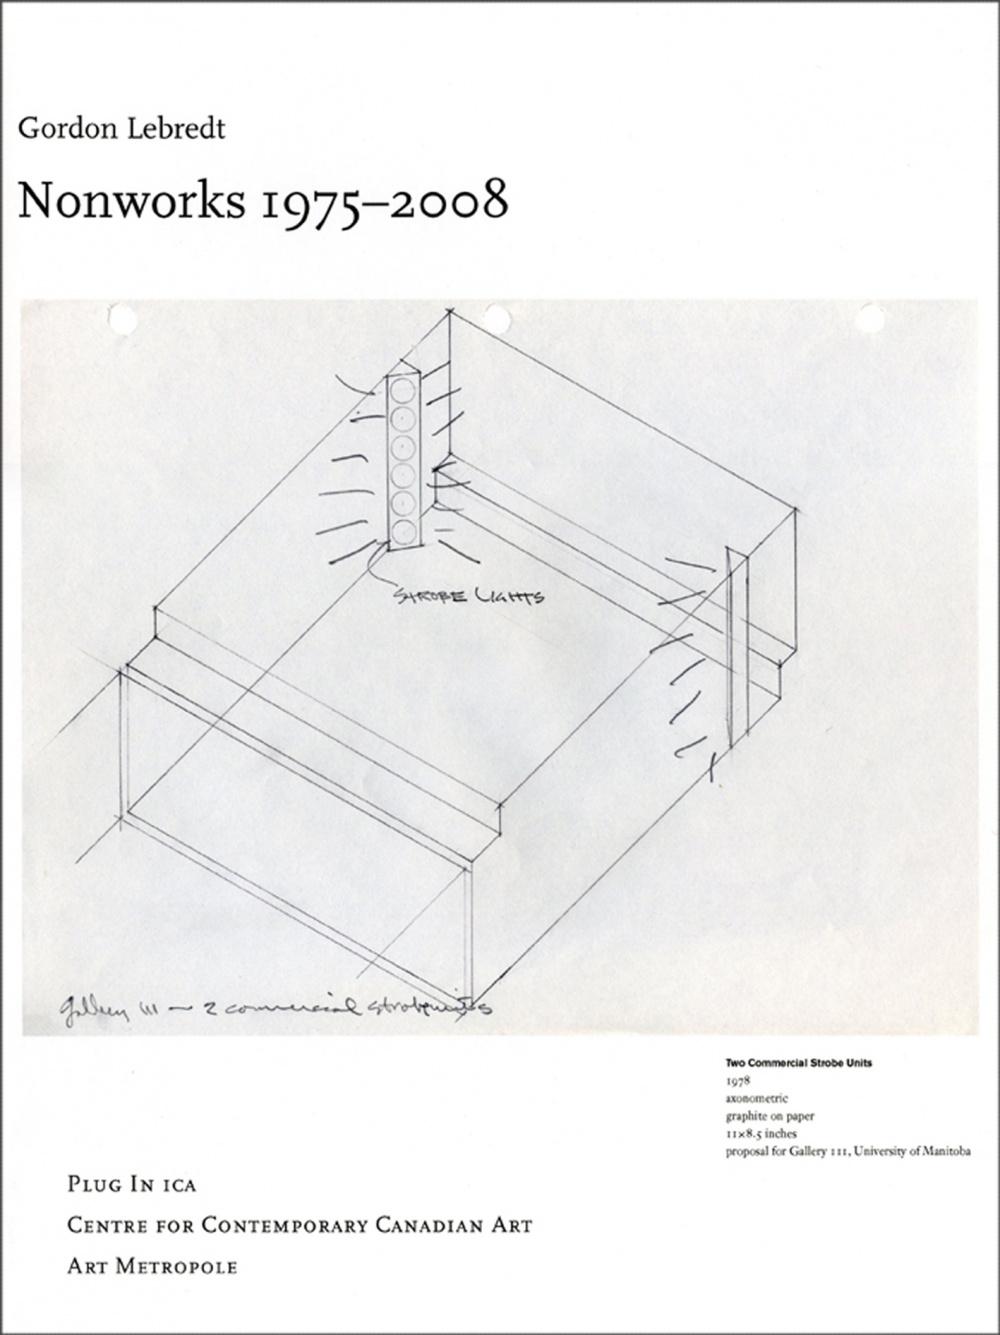 Gordon Lebredt: Nonworks 1975 - 2008